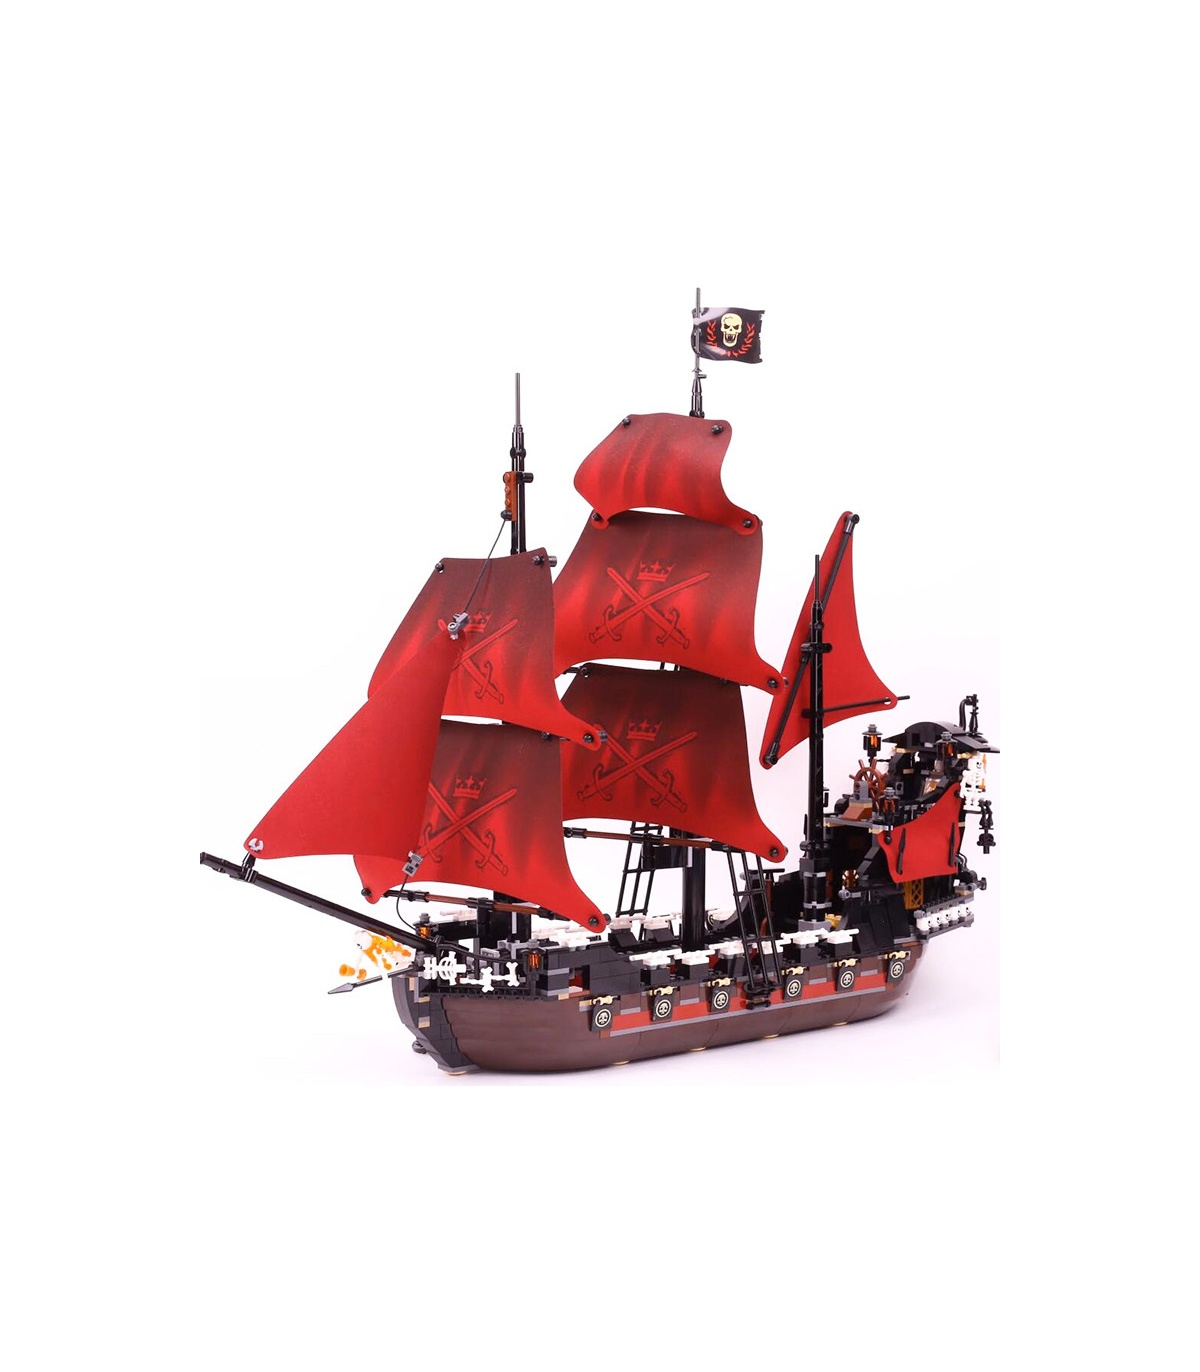 Queen Anne/'s Revenge Building Blocks Pirates of the Caribbean Model Set Children